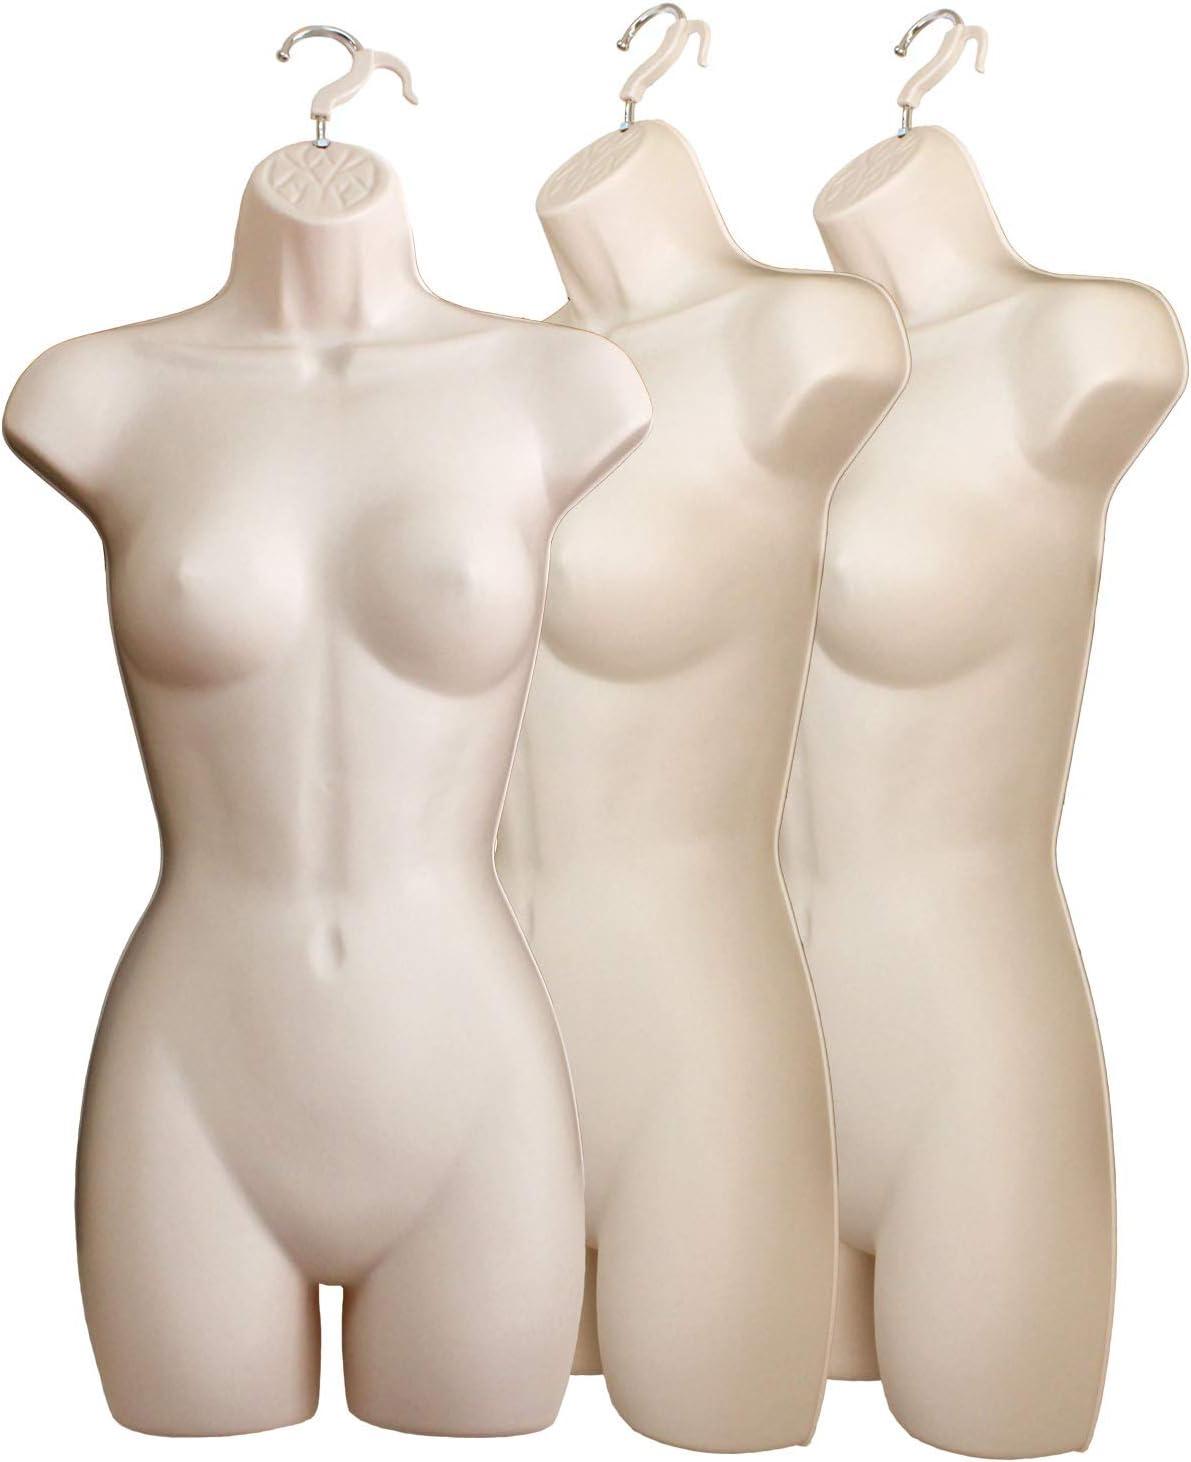 S-M Sizes 4 Flesh Mannequin Forms Male Female Child /& Toddler Torso Set /& Hanging Hook